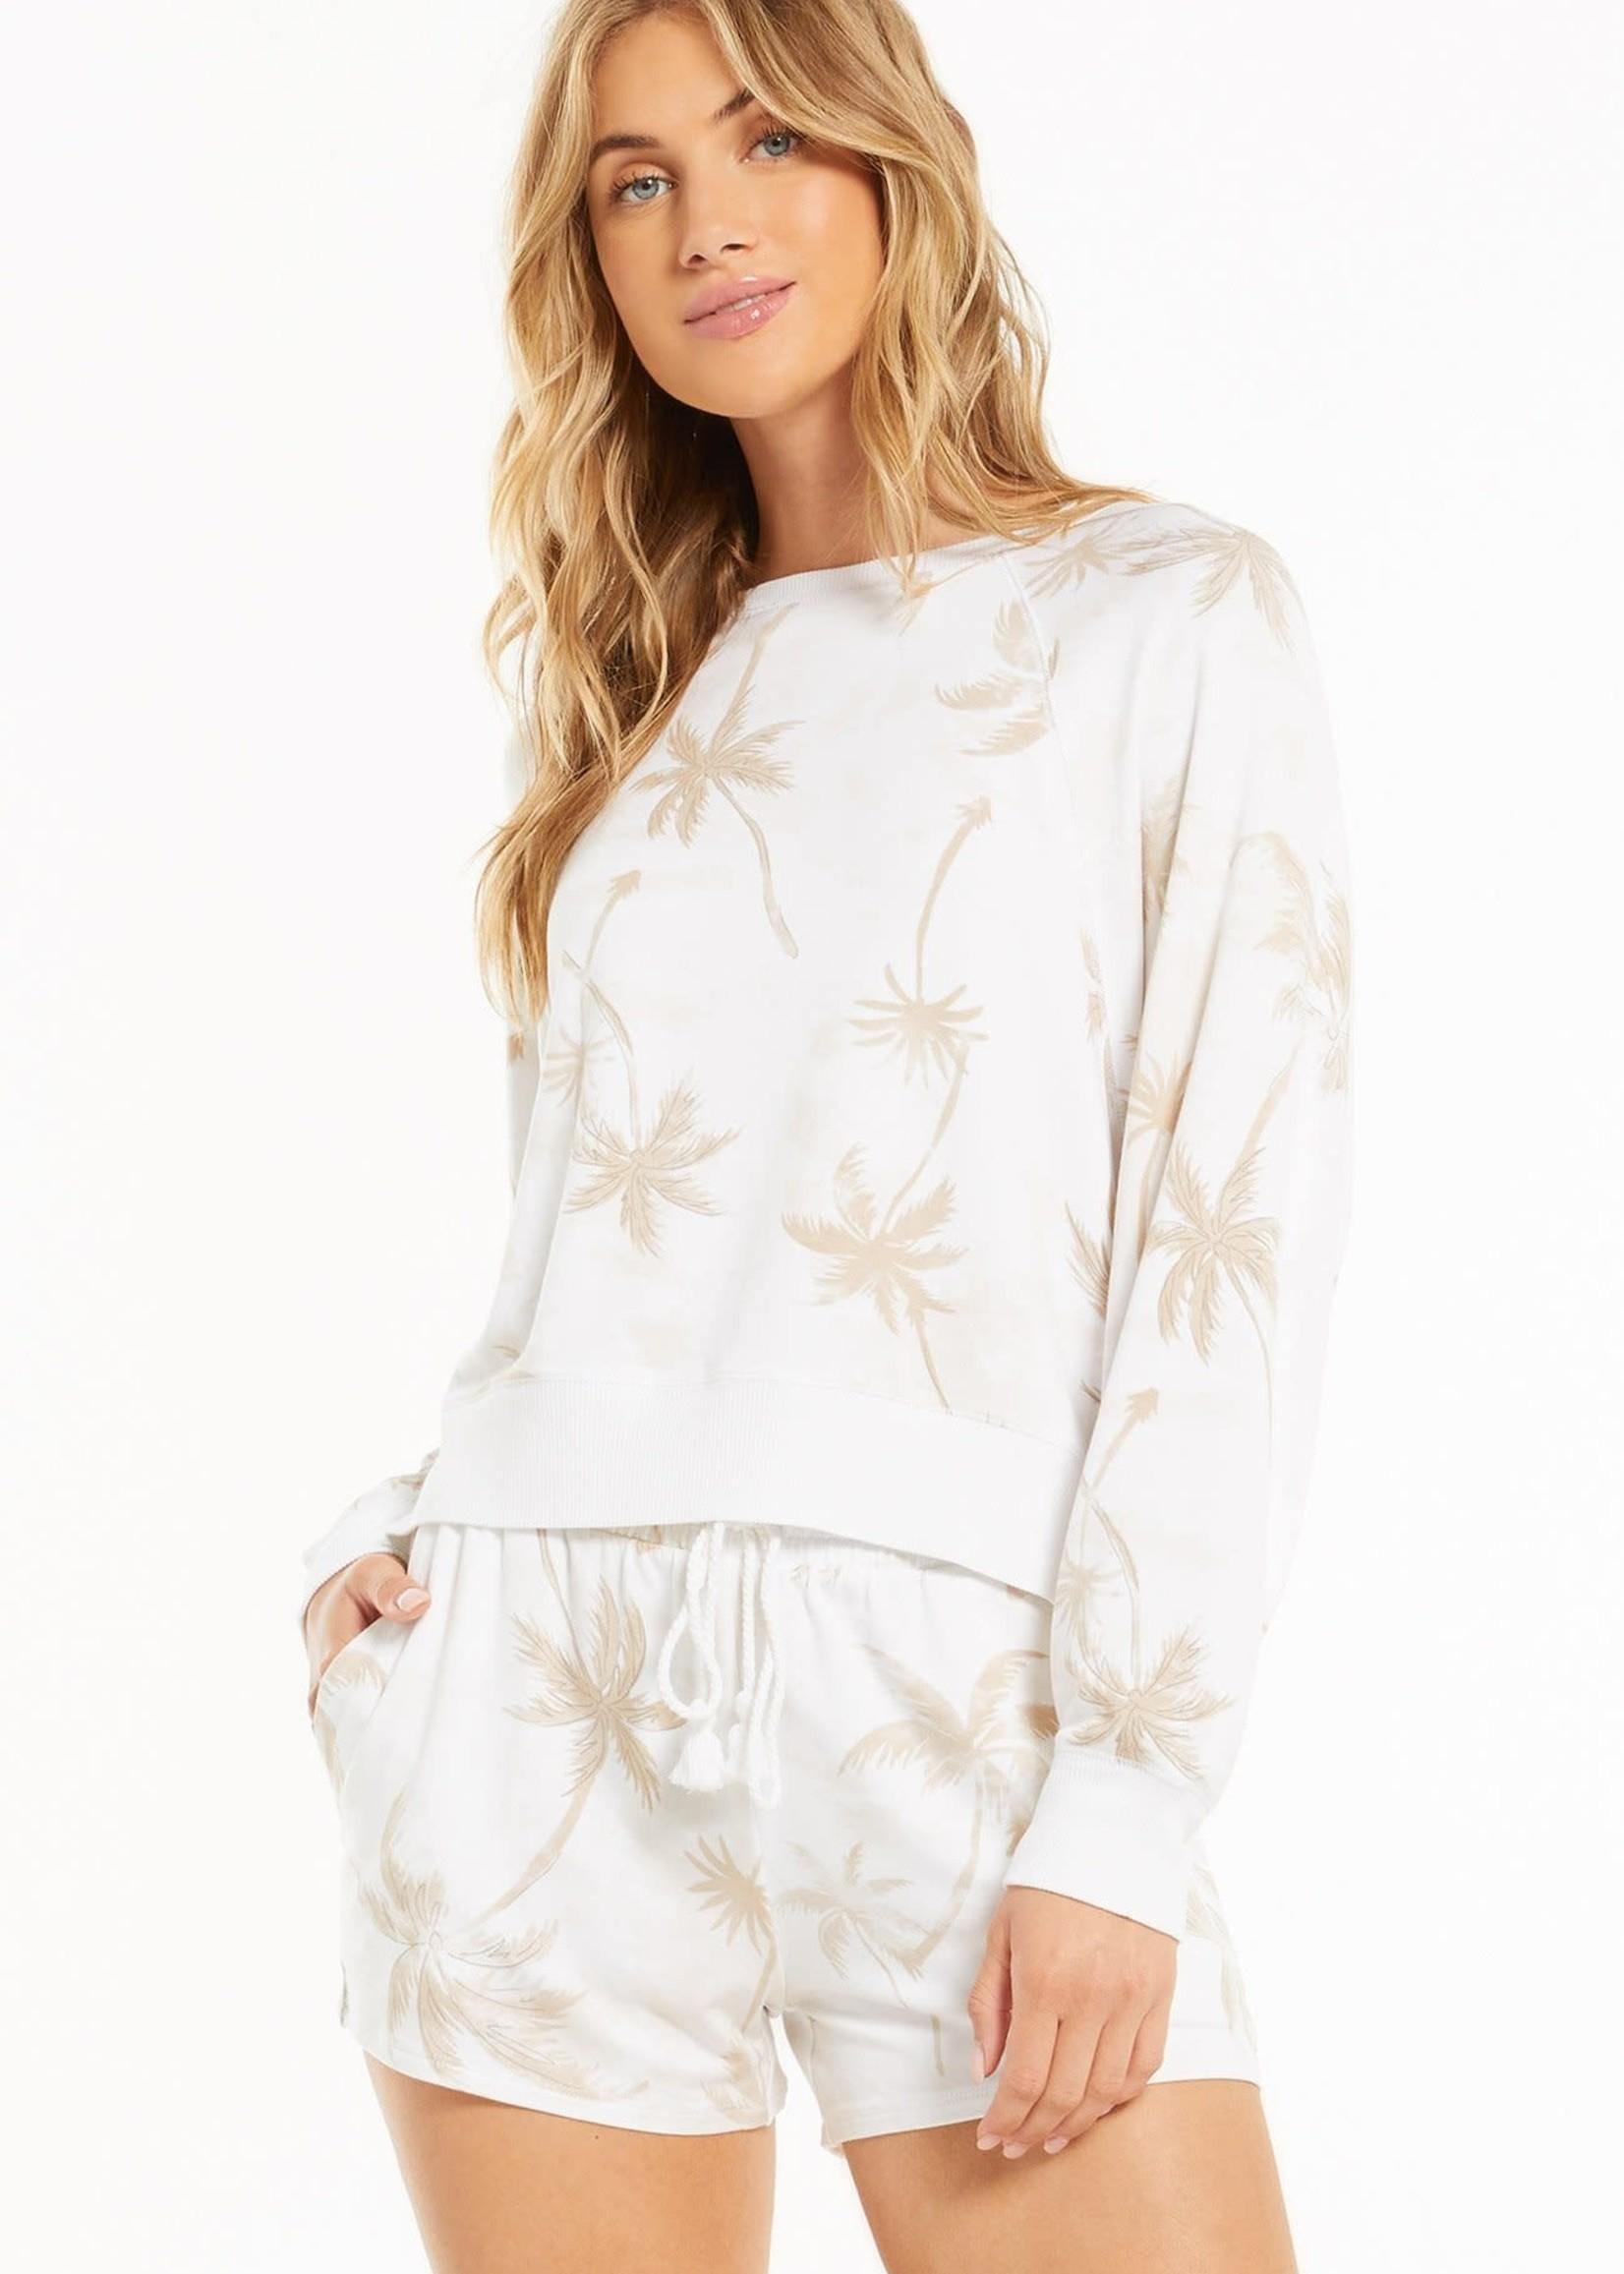 Z Supply Sleepover Palm Sweatshirt